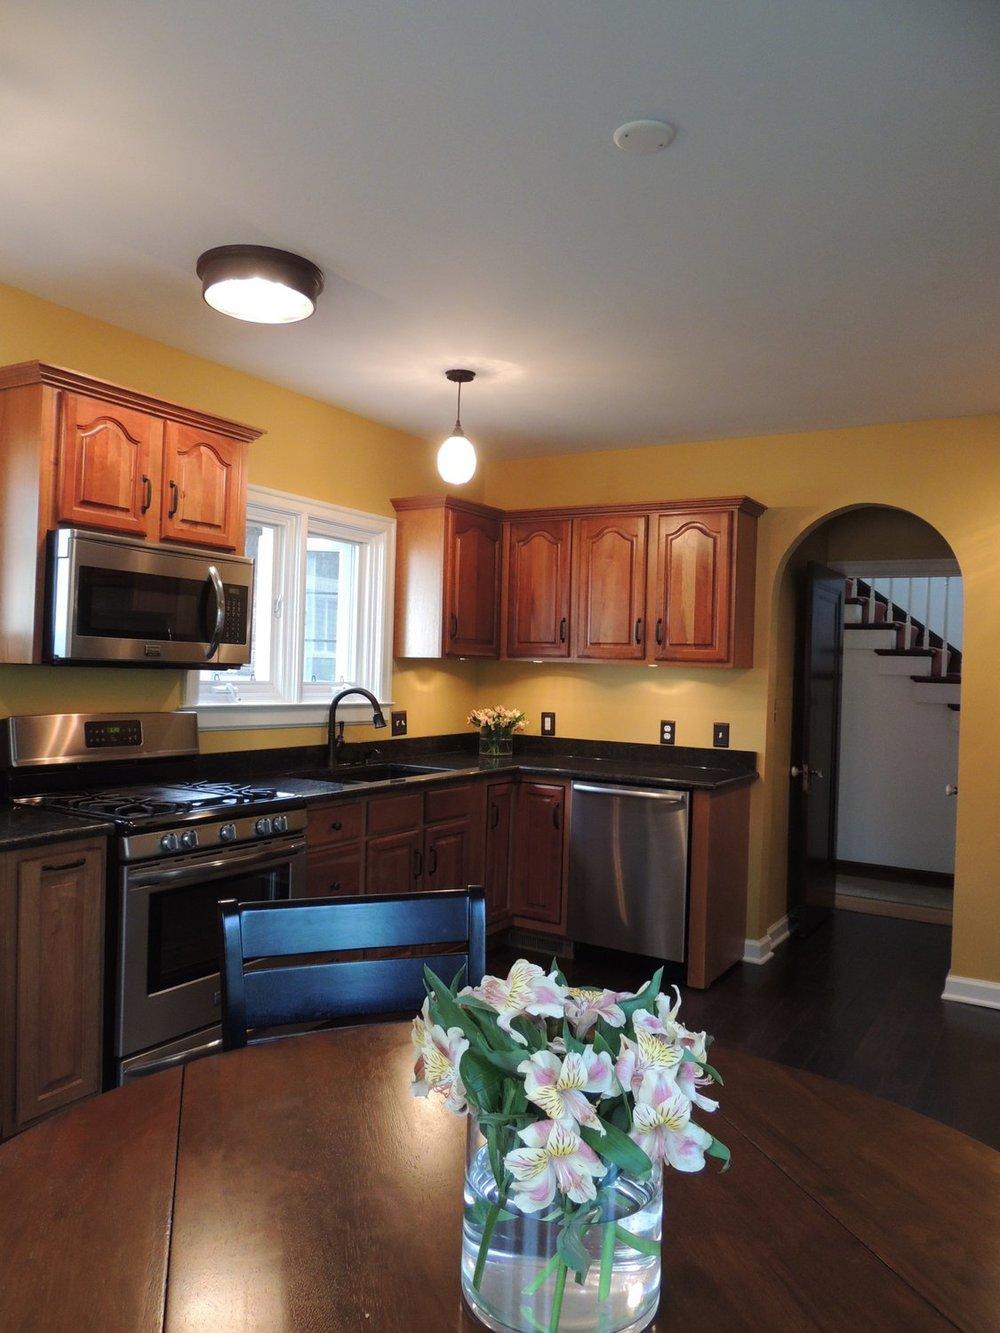 Historic Irvington Kitchen Remodel U2014 Indianapolis Remodeling Contractor | Kitchen  Remodeling, Room Additions, Custom Home Building, Whole House Renovations